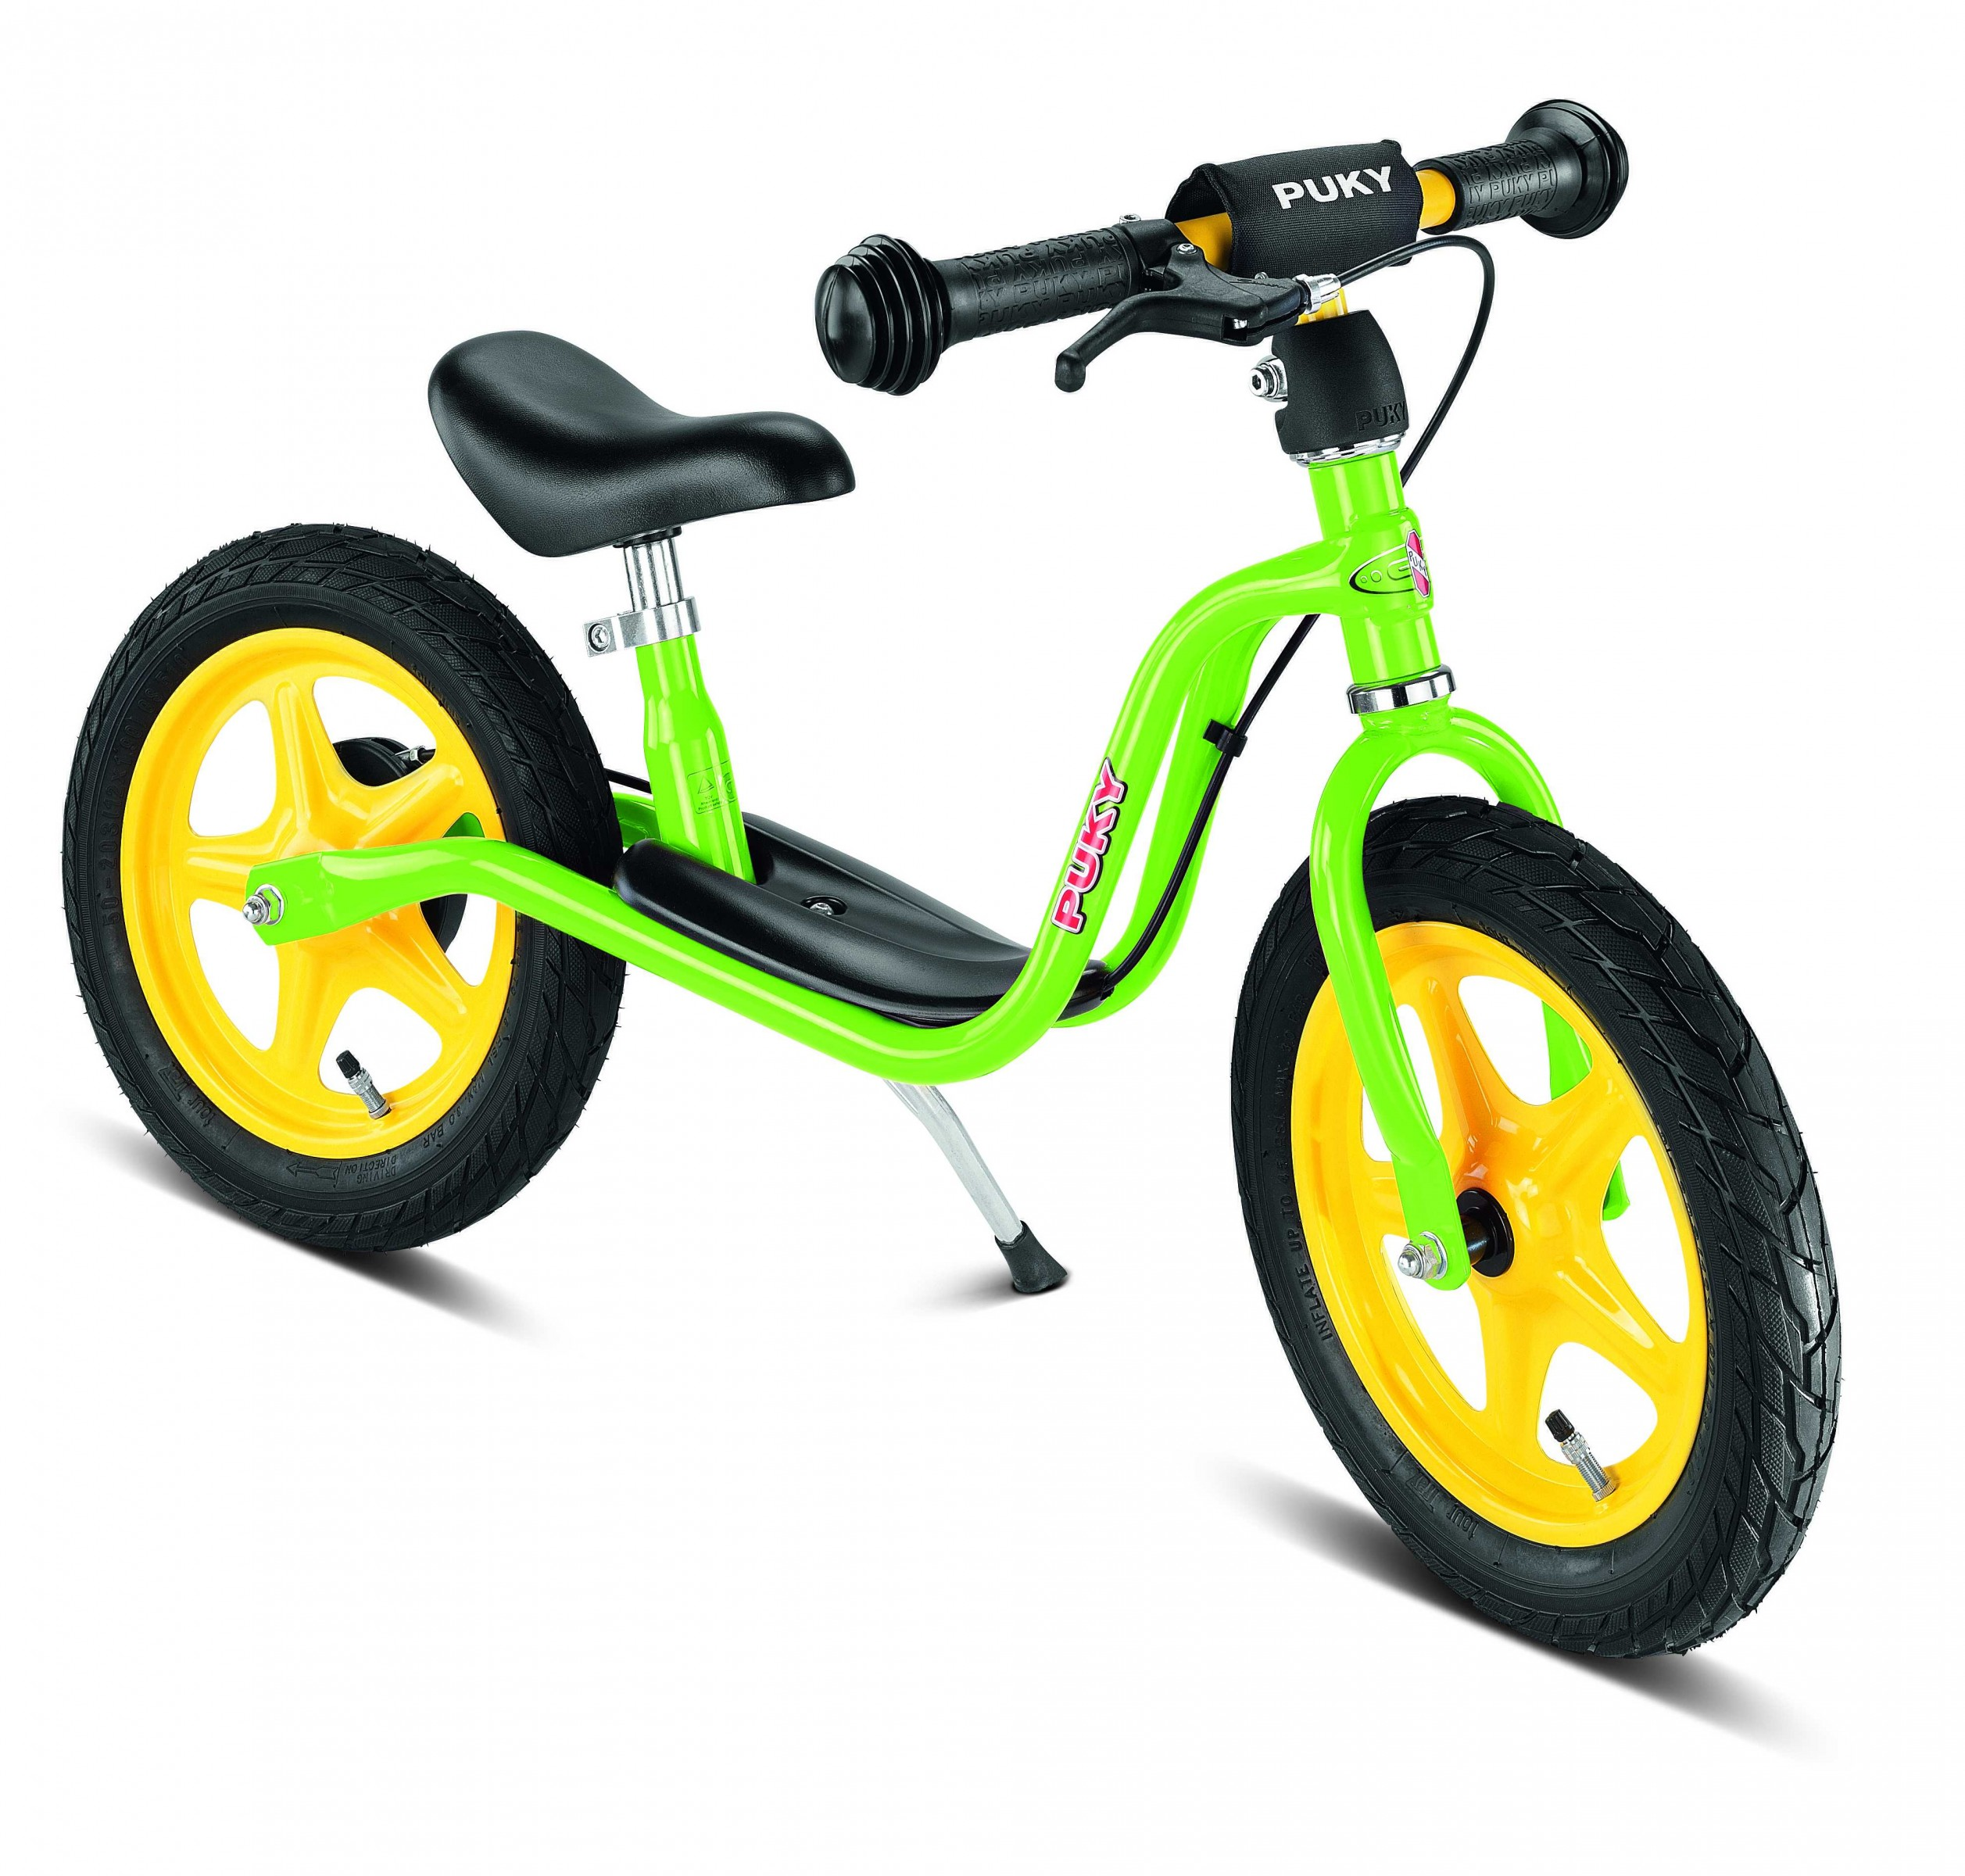 Puky Laufrad Standard mit Bremse kiwi